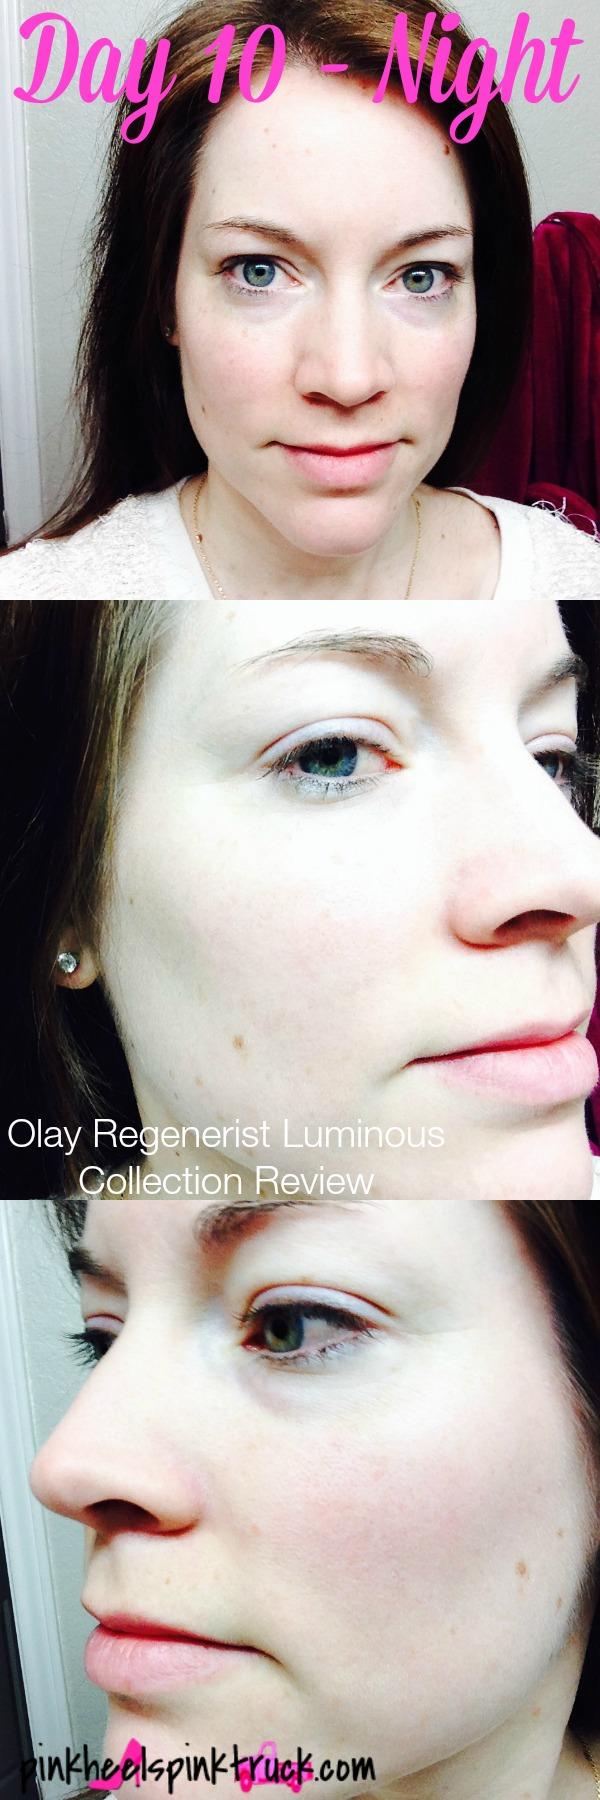 Olay Regenerist Luminous Collection Day 10 Night